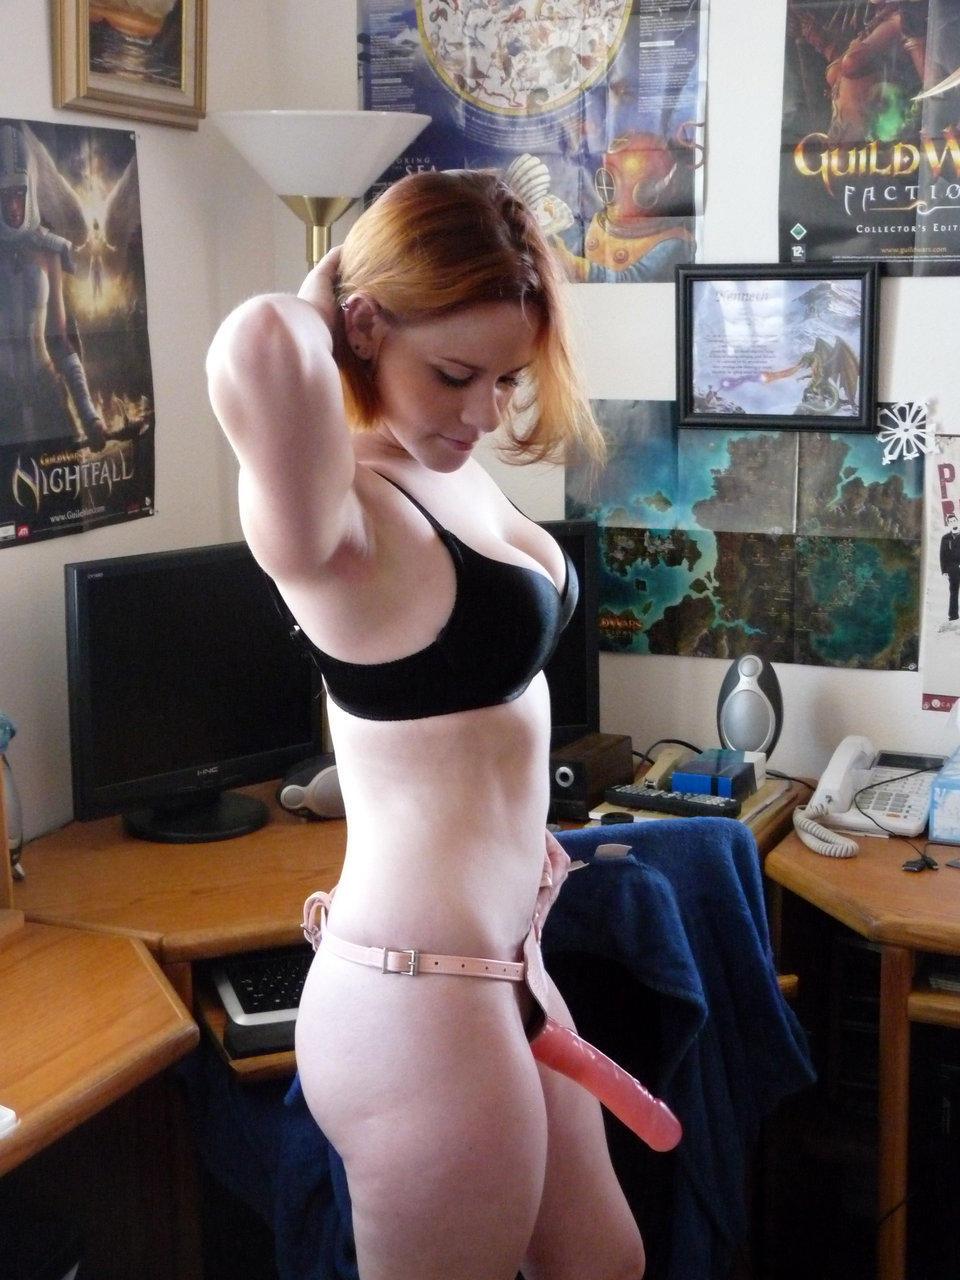 Girl on girl strapon porn